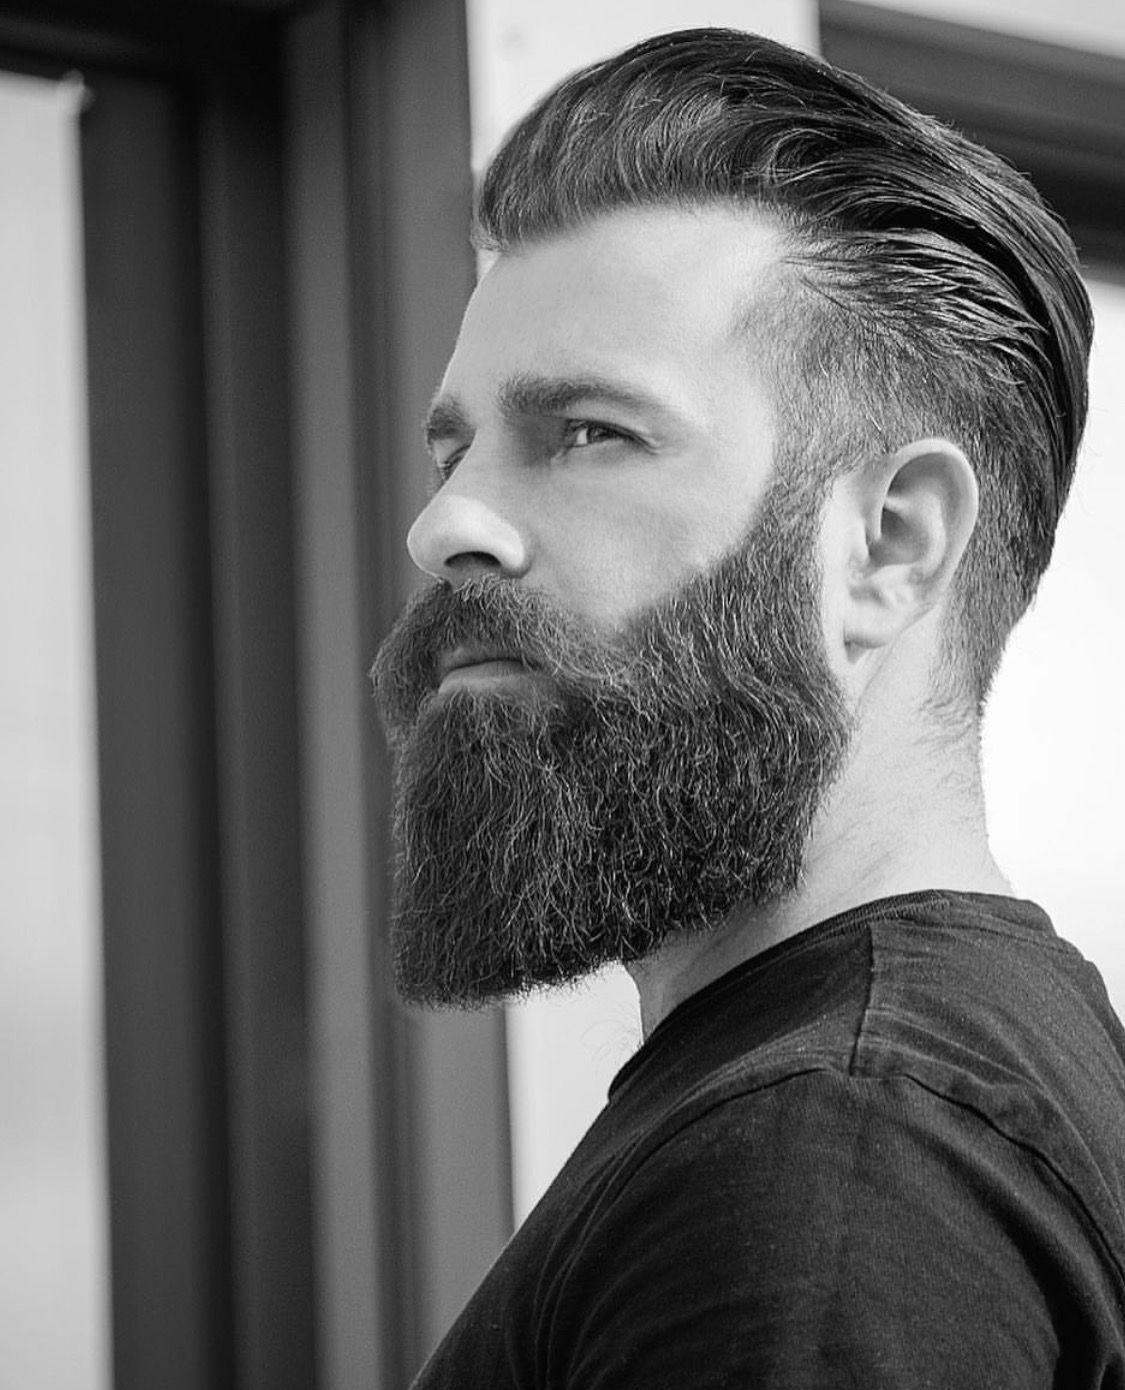 Beardo in 2019